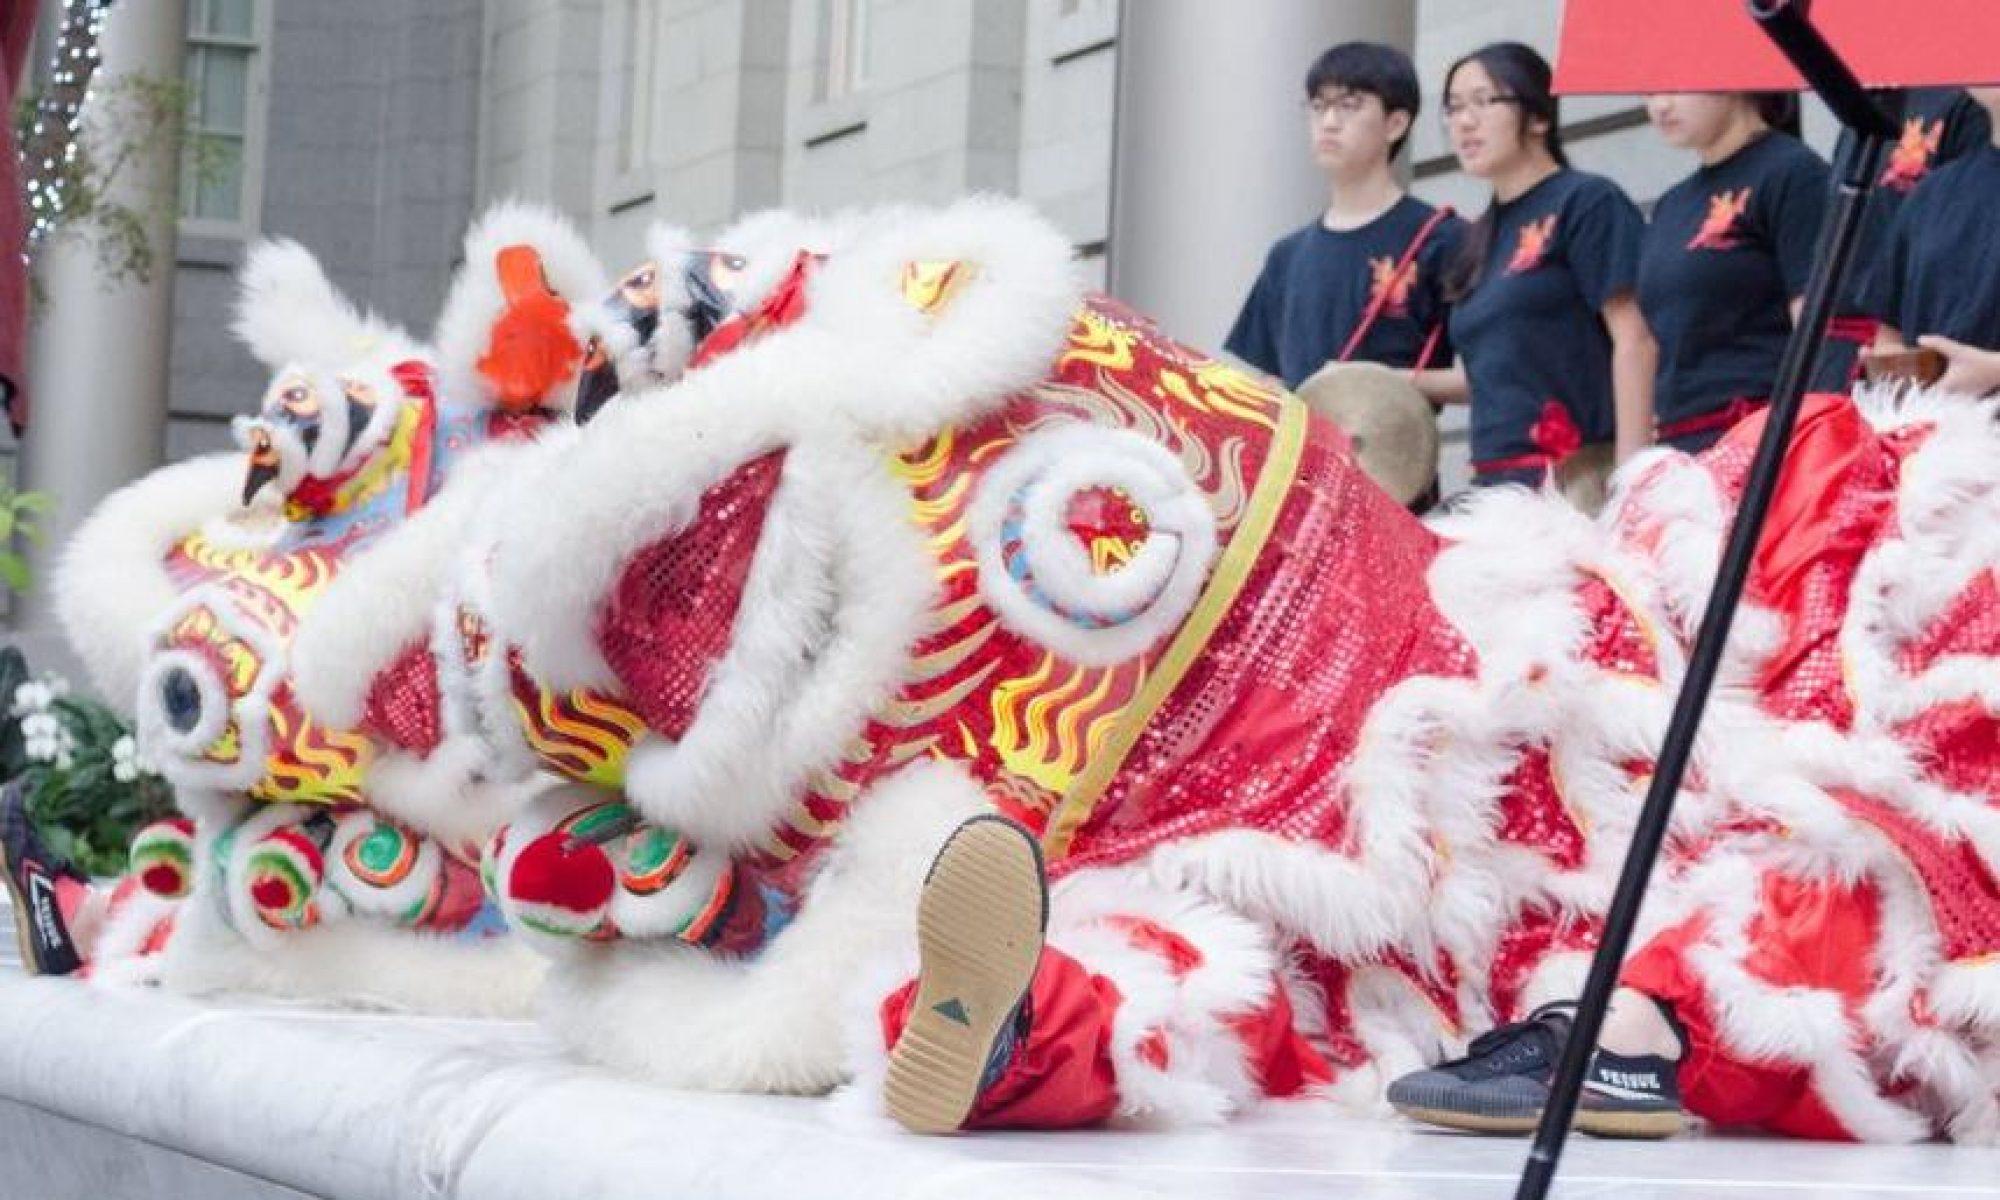 JHU Yong Han Lion Dance Troupe